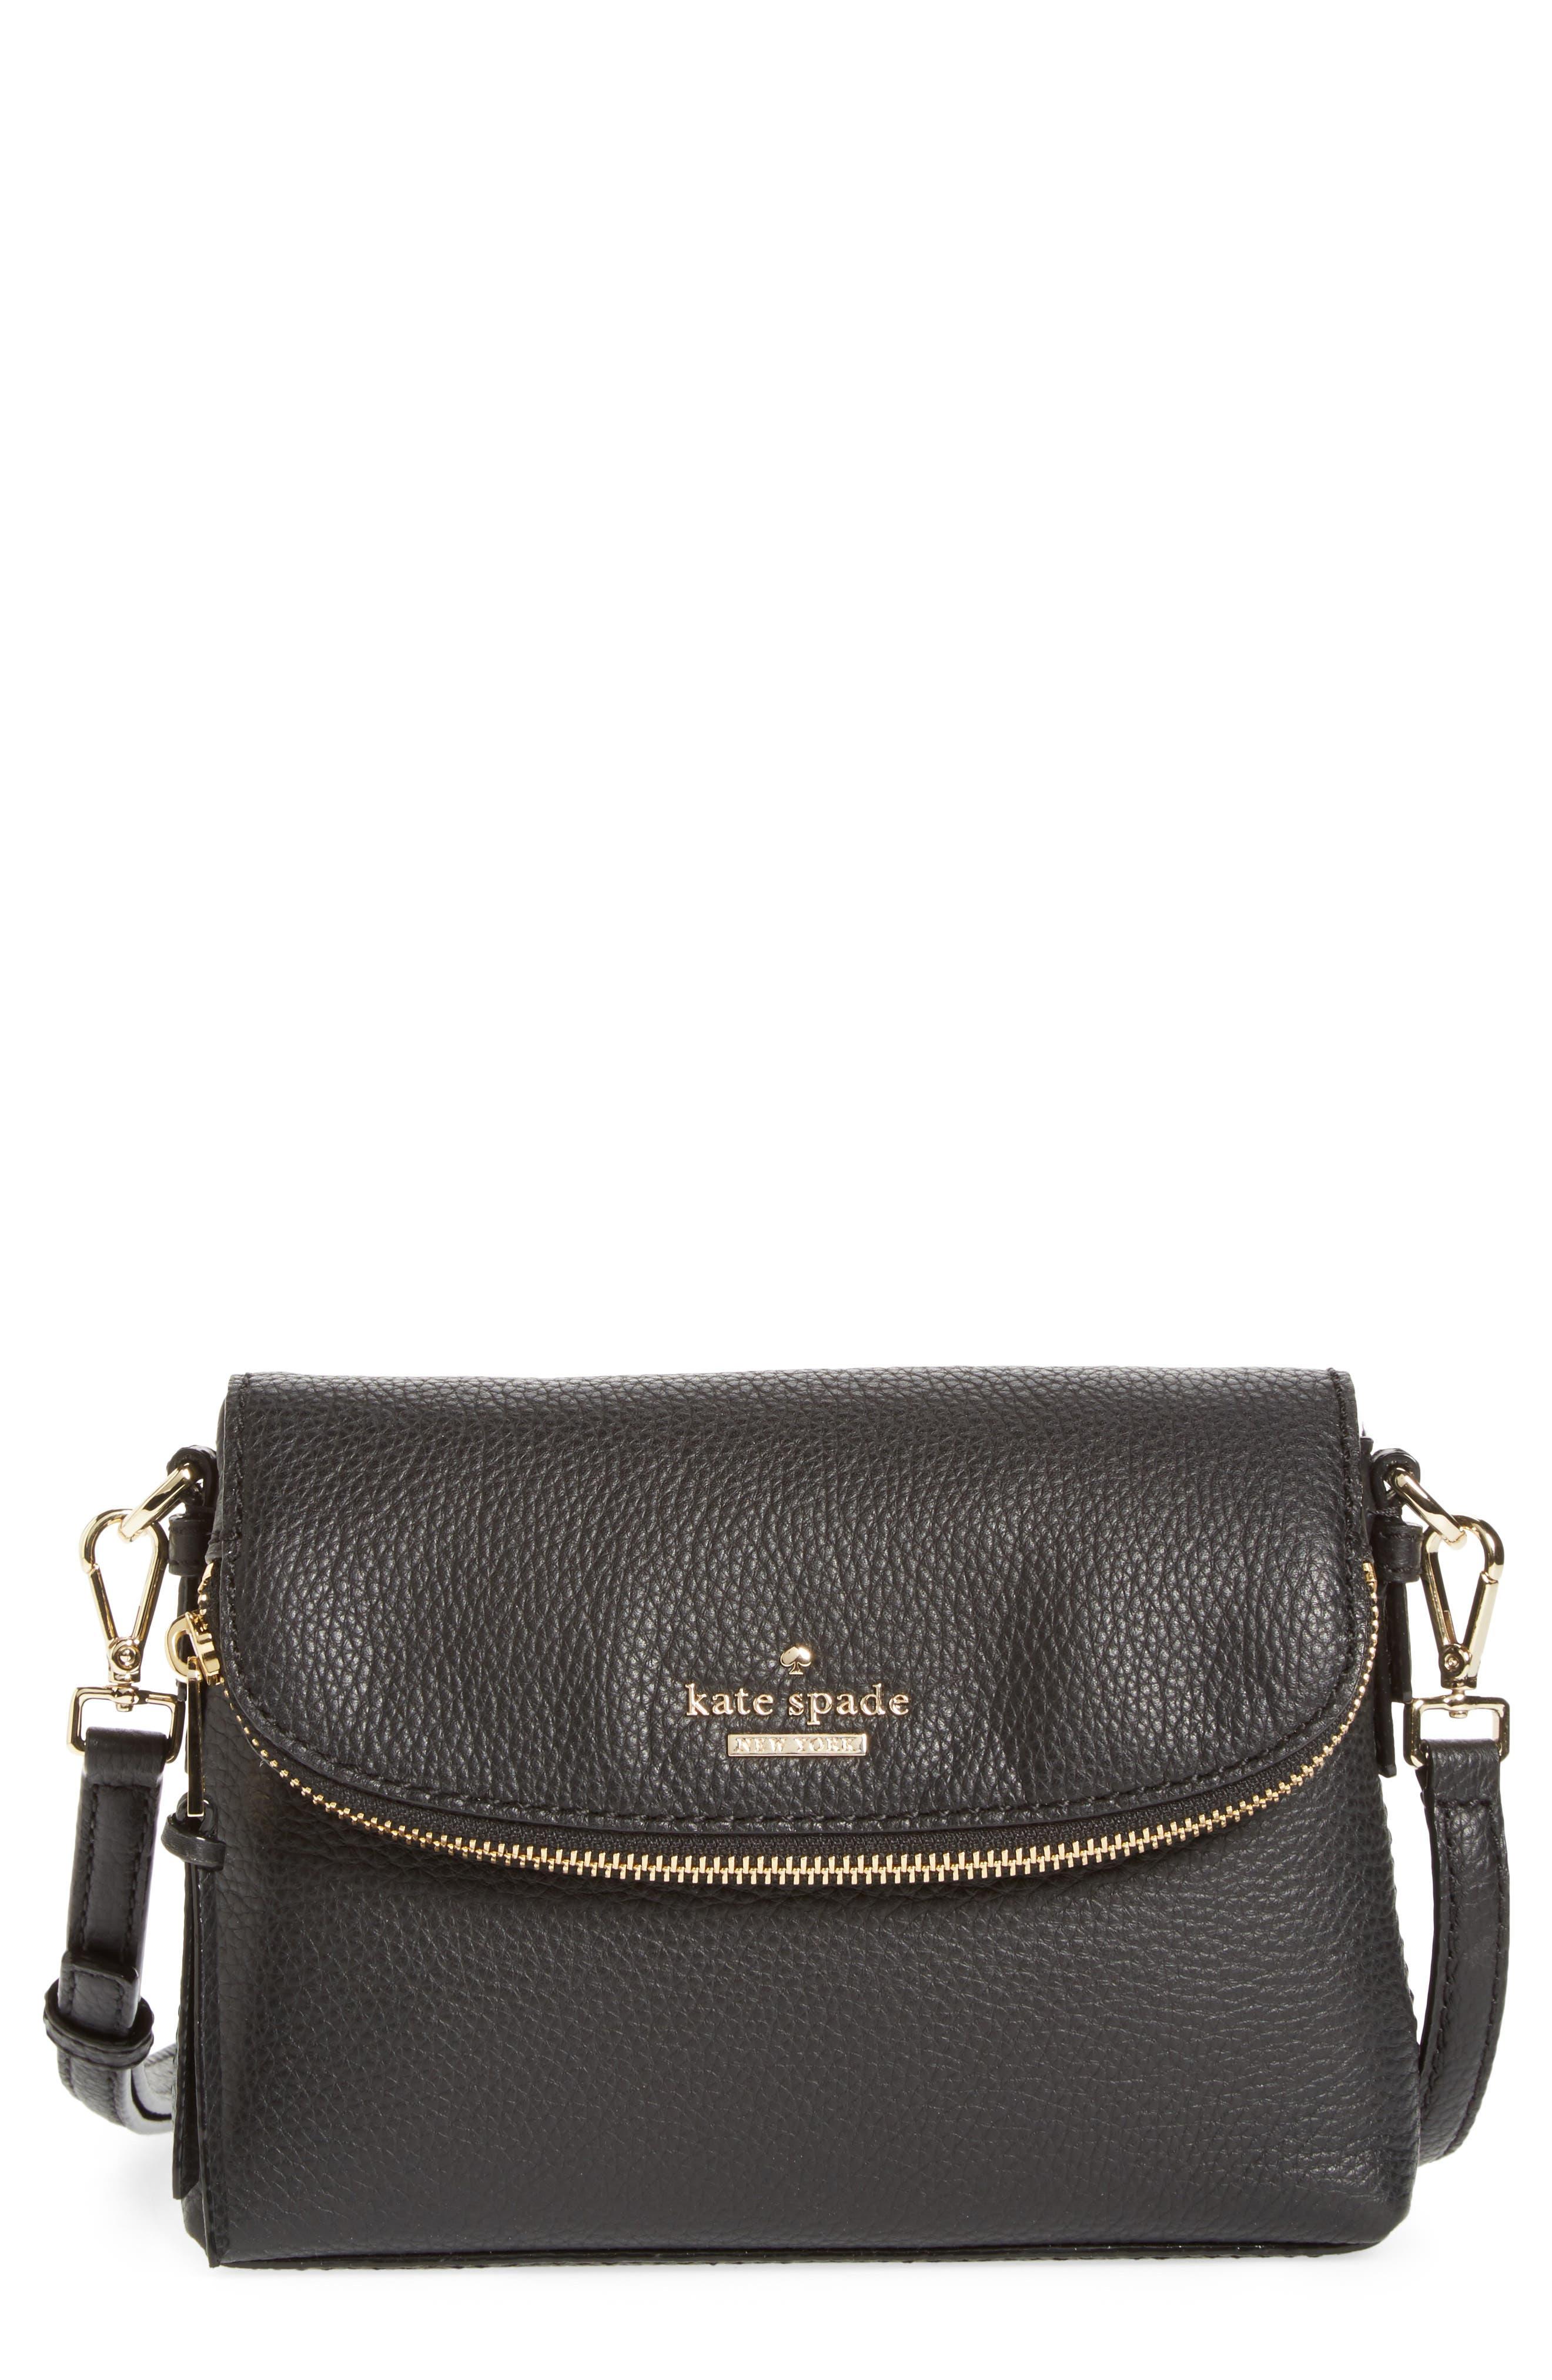 KATE SPADE NEW YORK jackson street harlyn leather crossbody bag